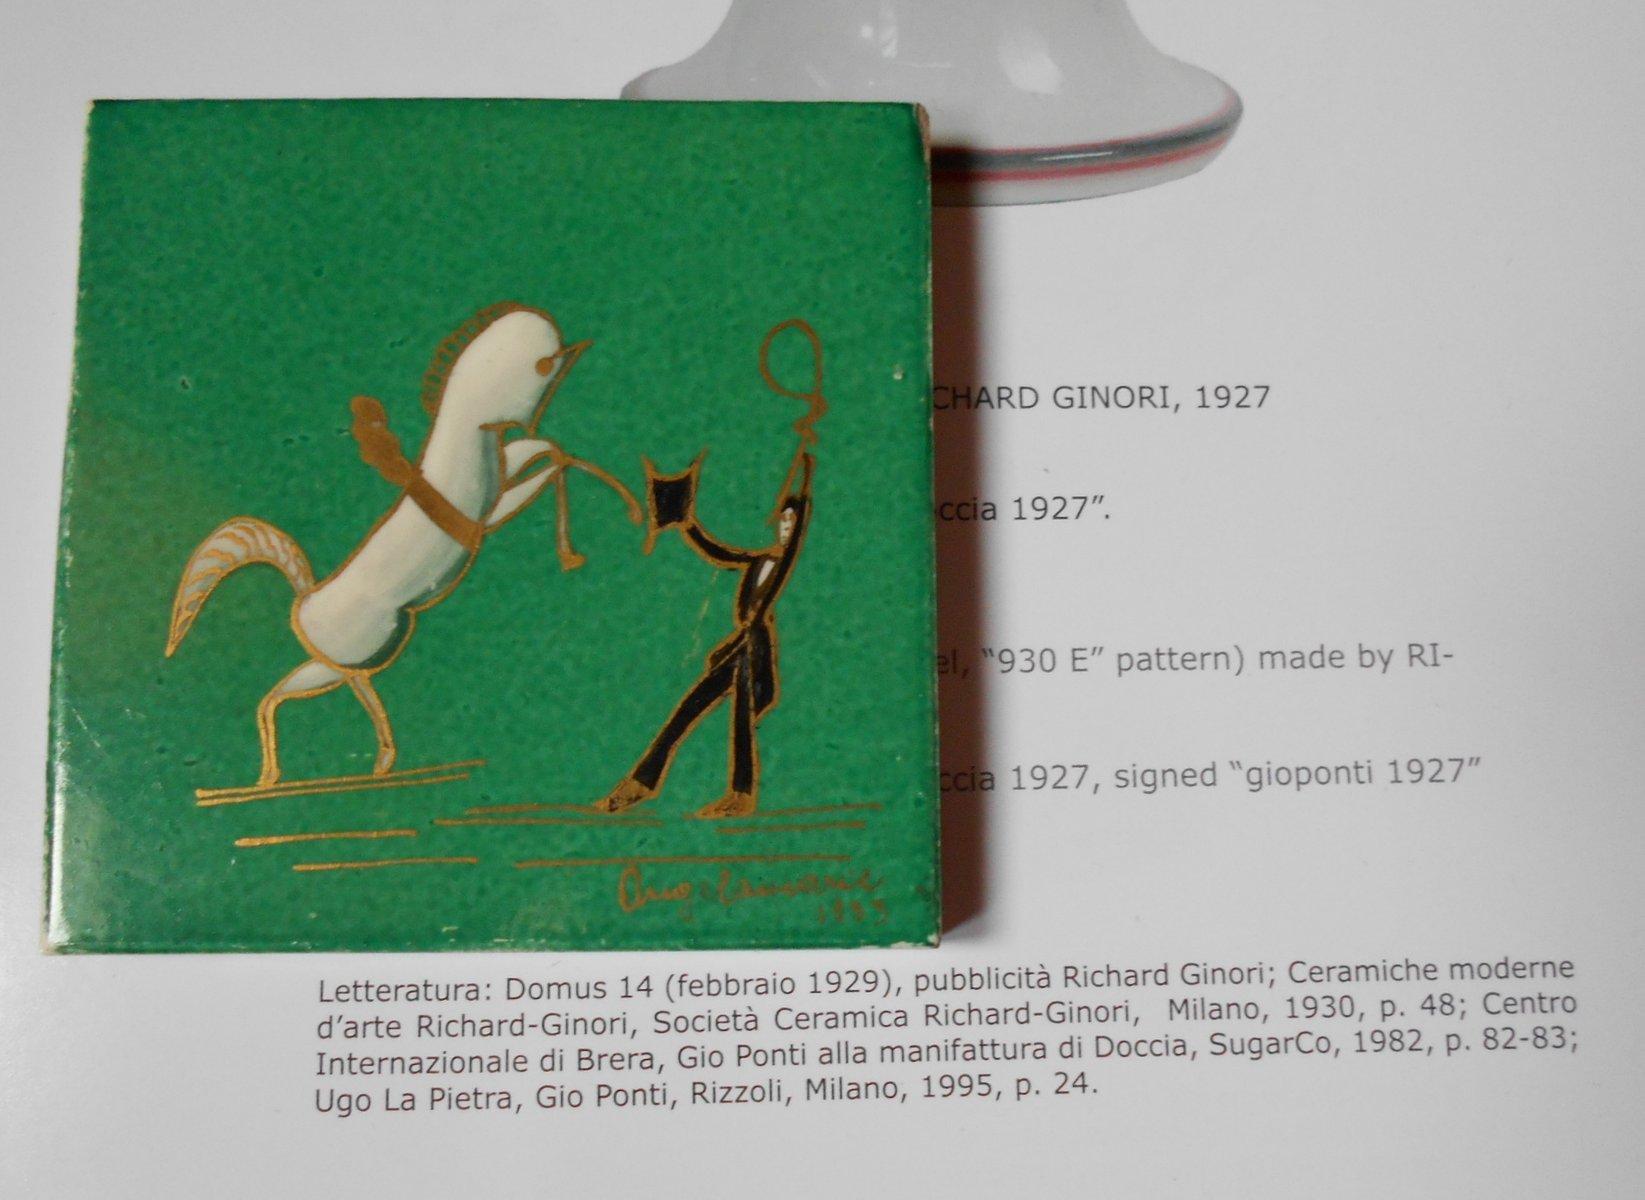 Art deco ceramic tile by gio ponti for richard ginori 1933 for price 72300 regular price 77500 dailygadgetfo Images